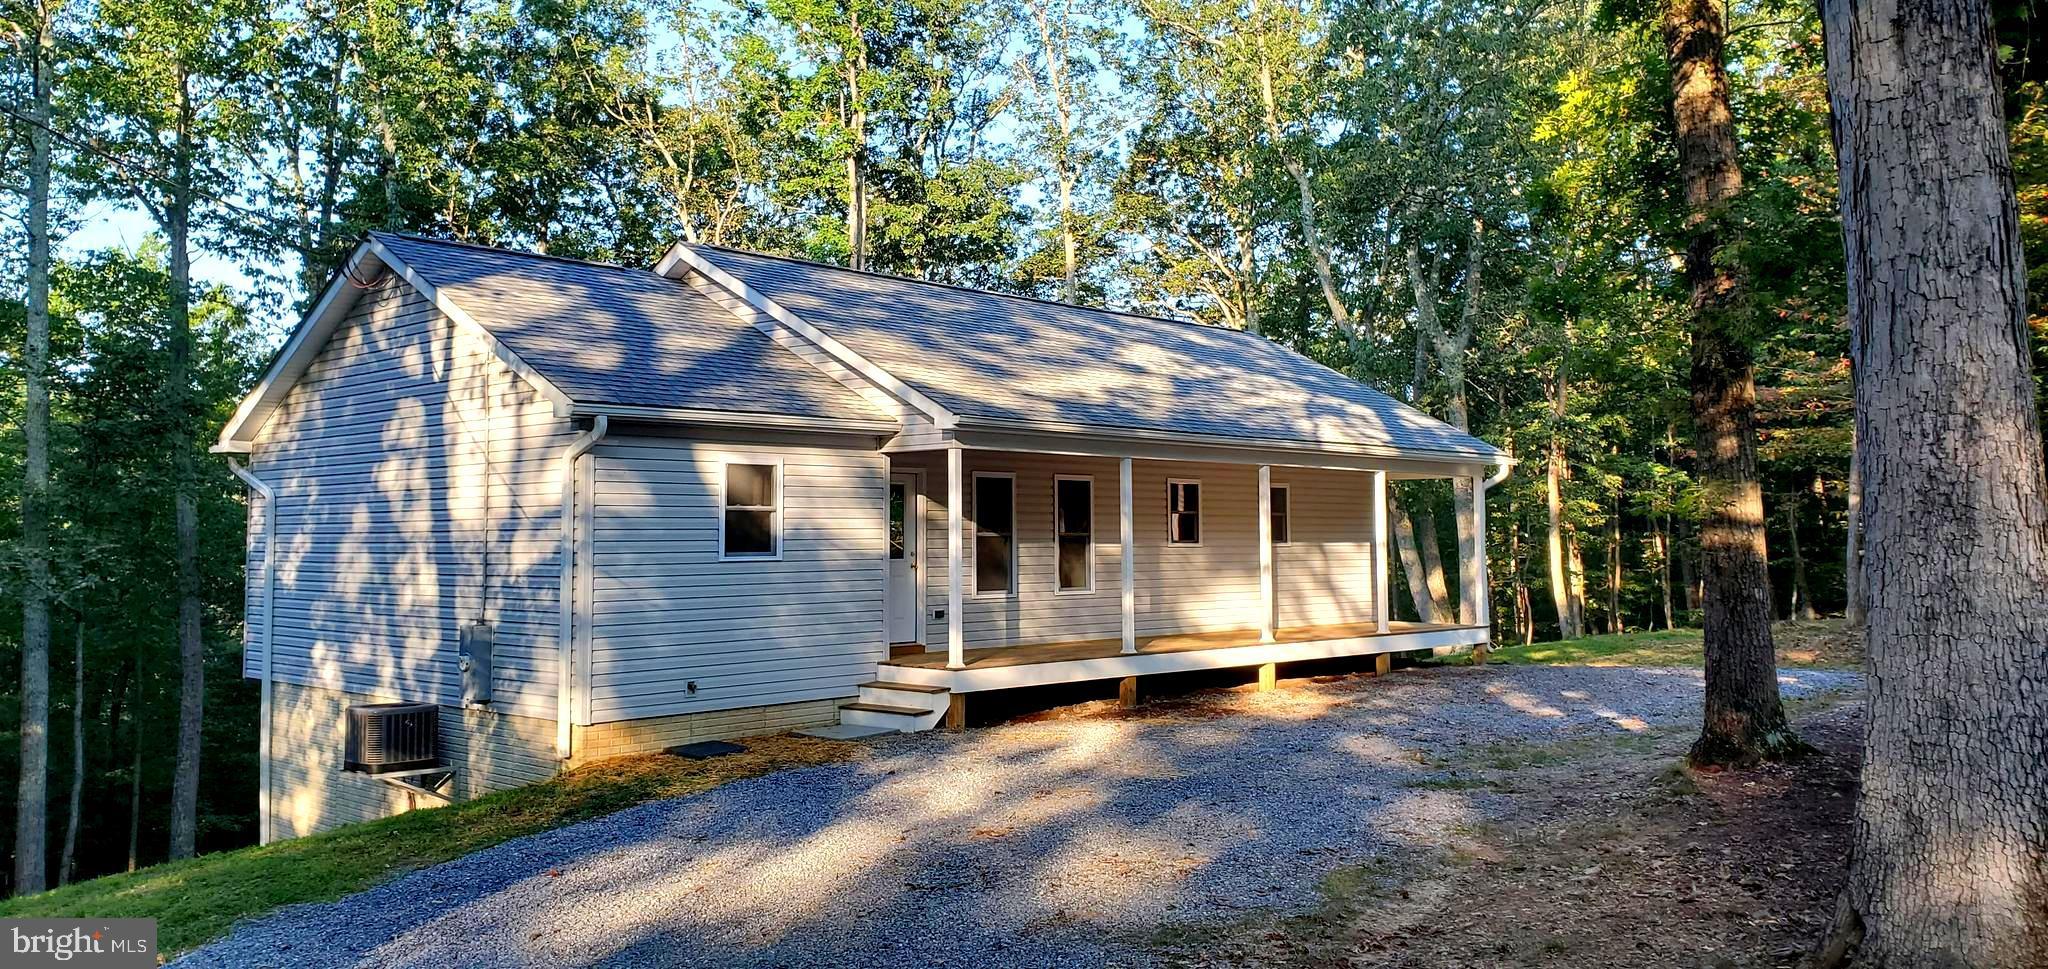 1221 Beechwood Ln, Bluemont, VA, 20135